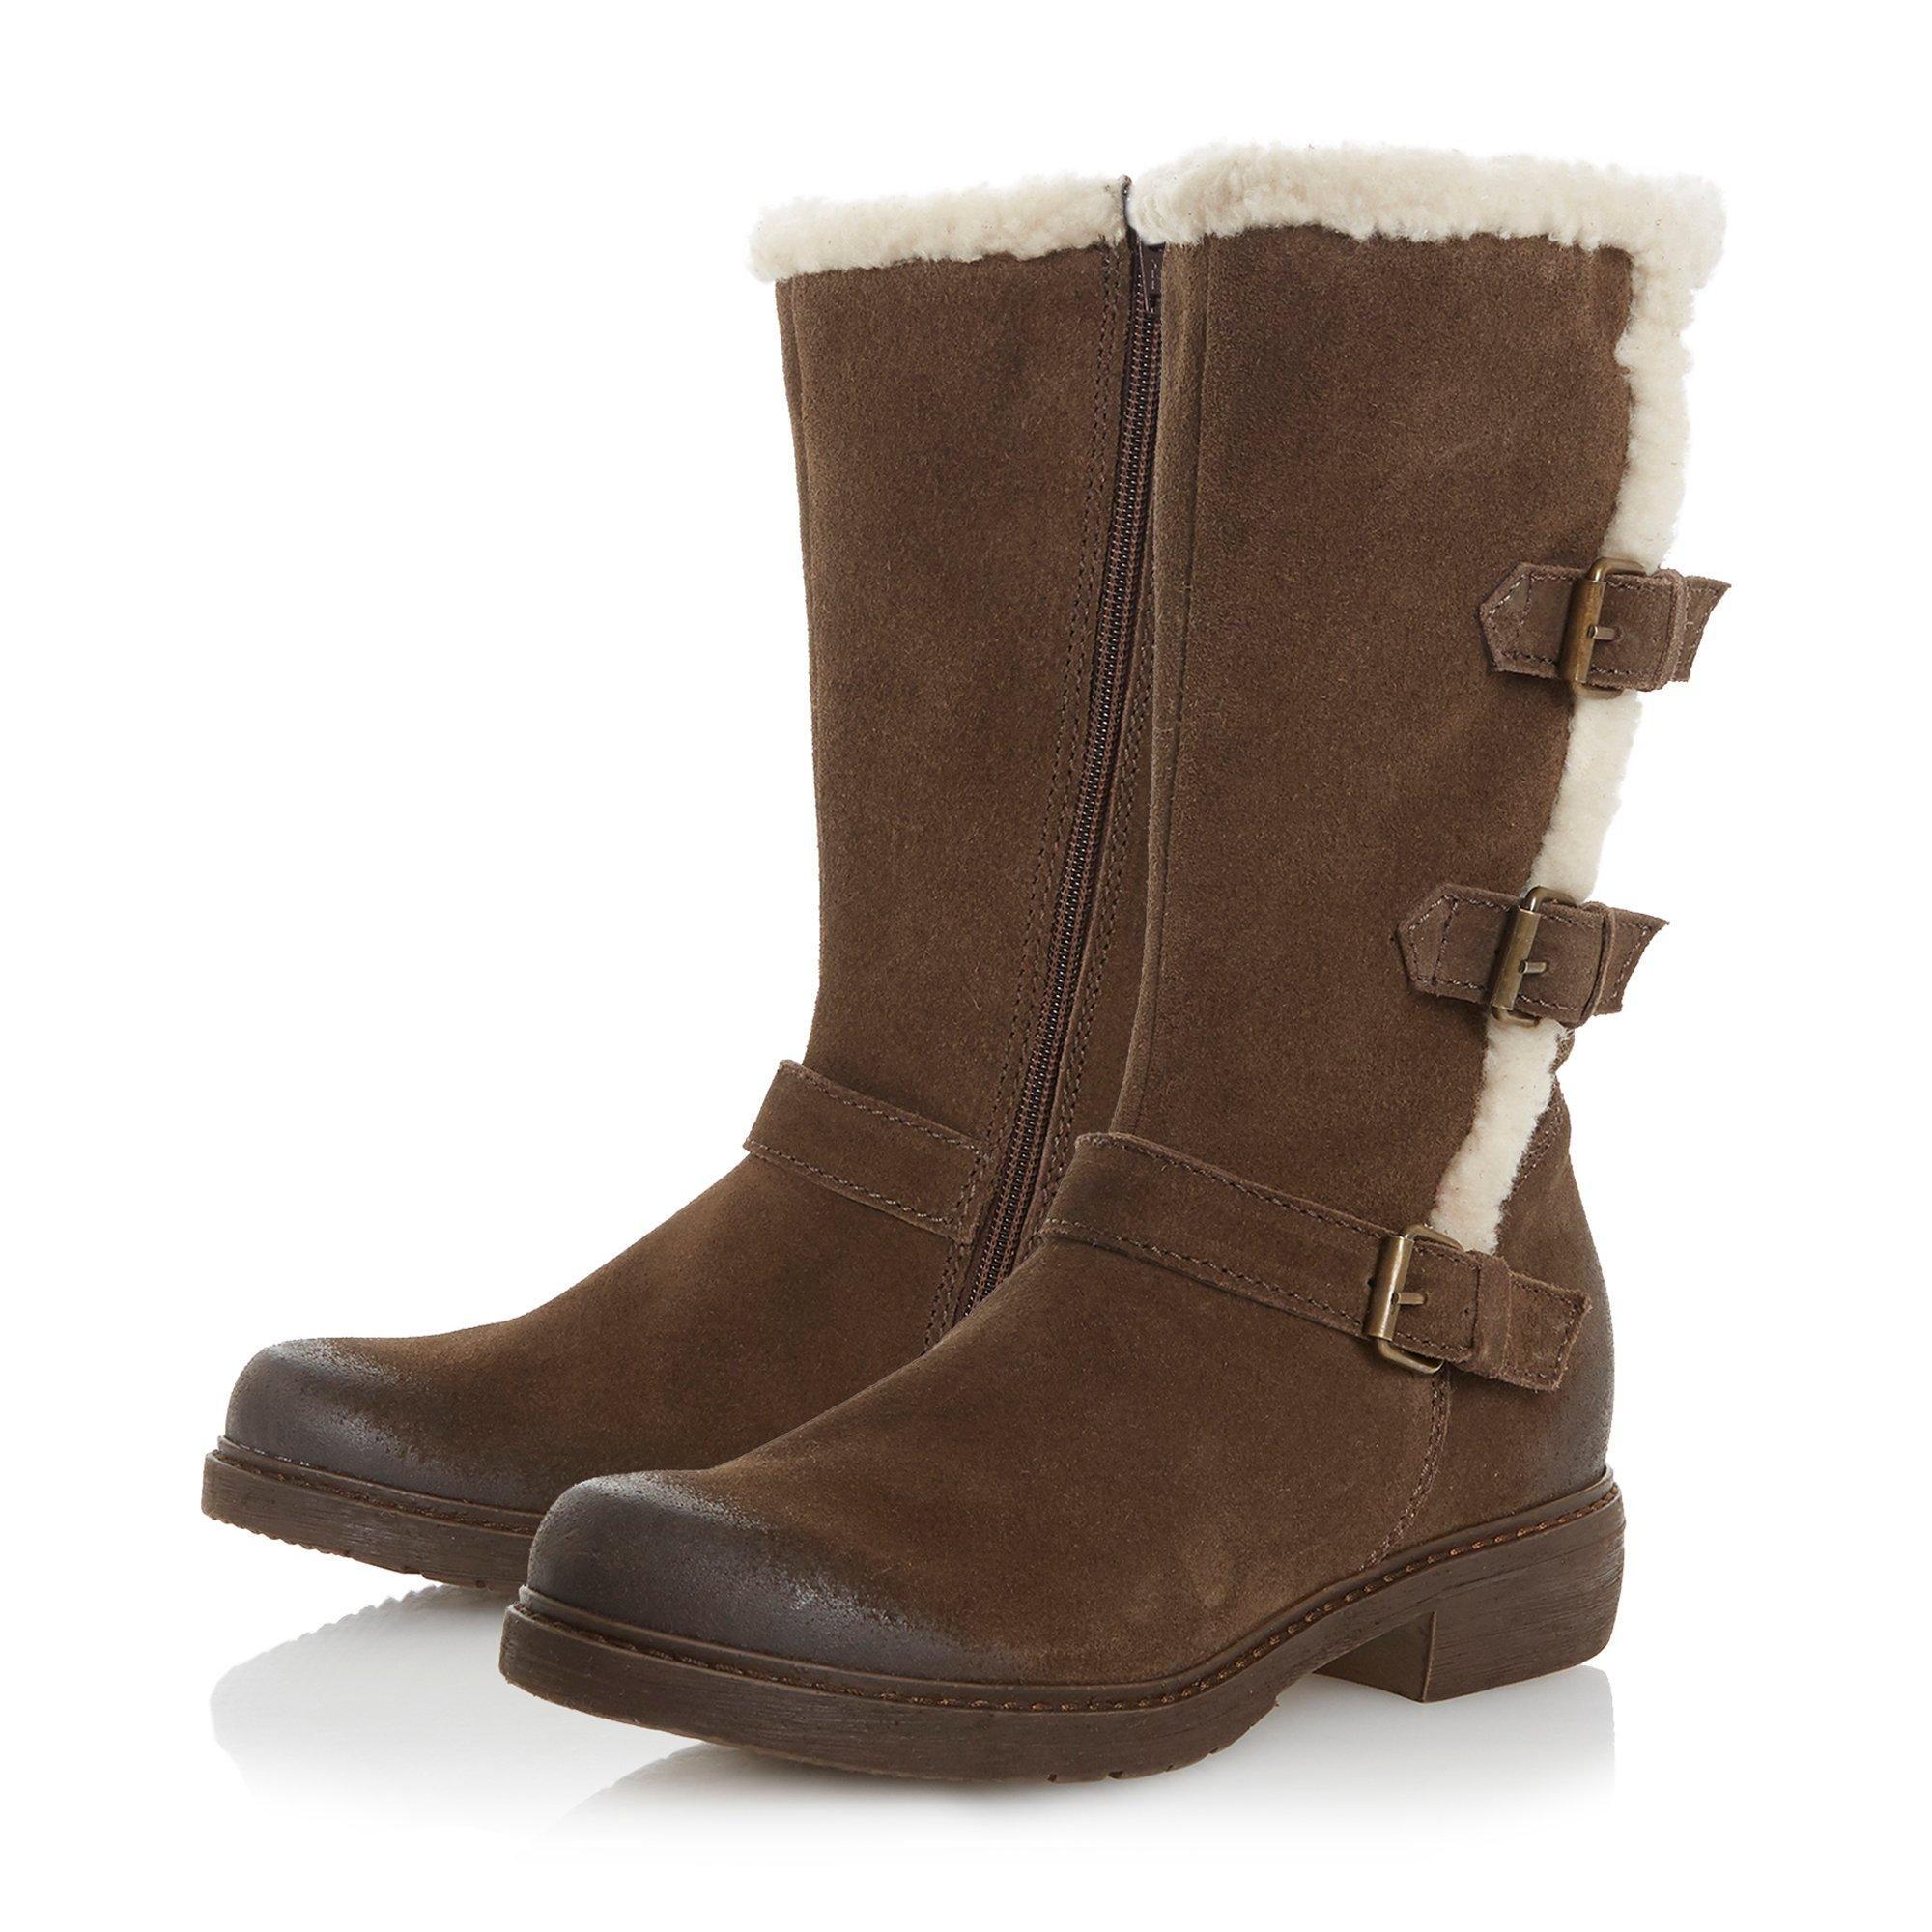 Dune Ladies REACTIVE Fur Lined Buckle Calf Boots